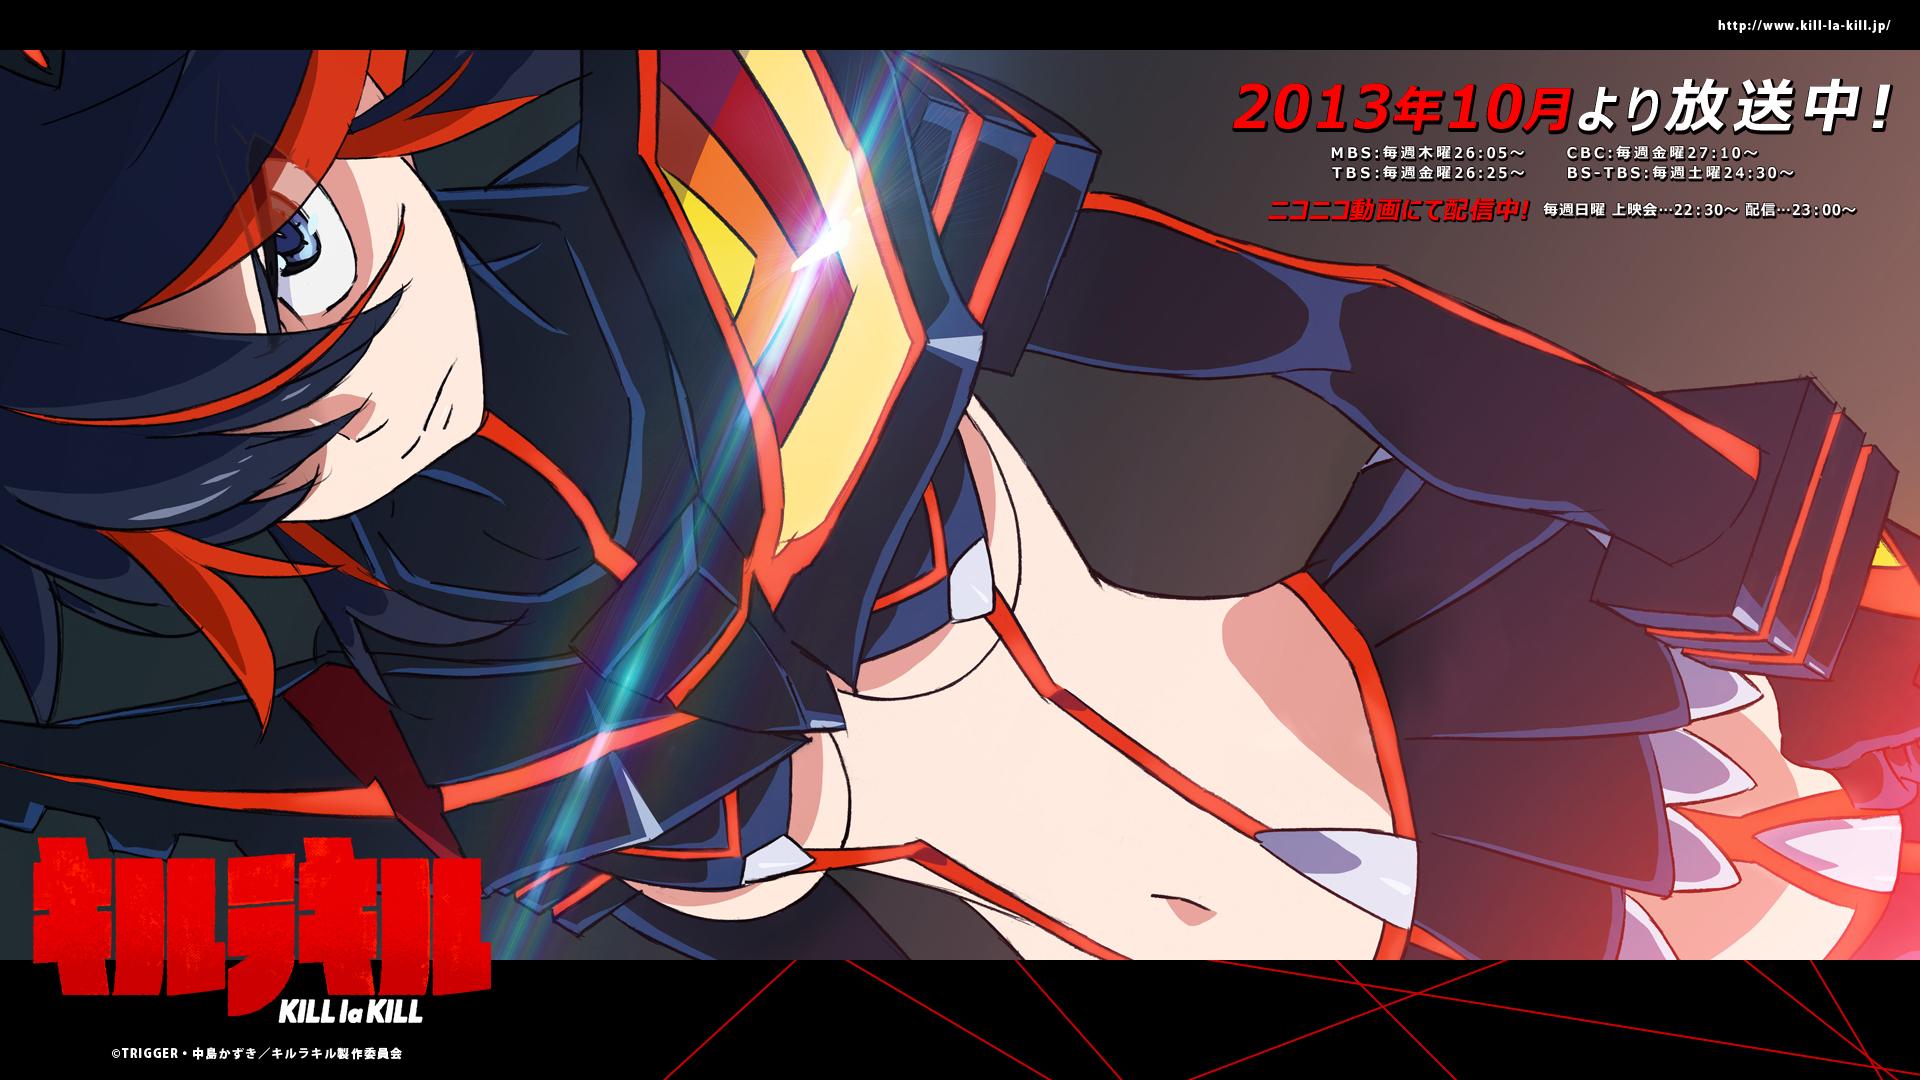 Hunter Hunter 高画質pc Ps3壁紙 1 アニメキャラ アニメ ゴンキル